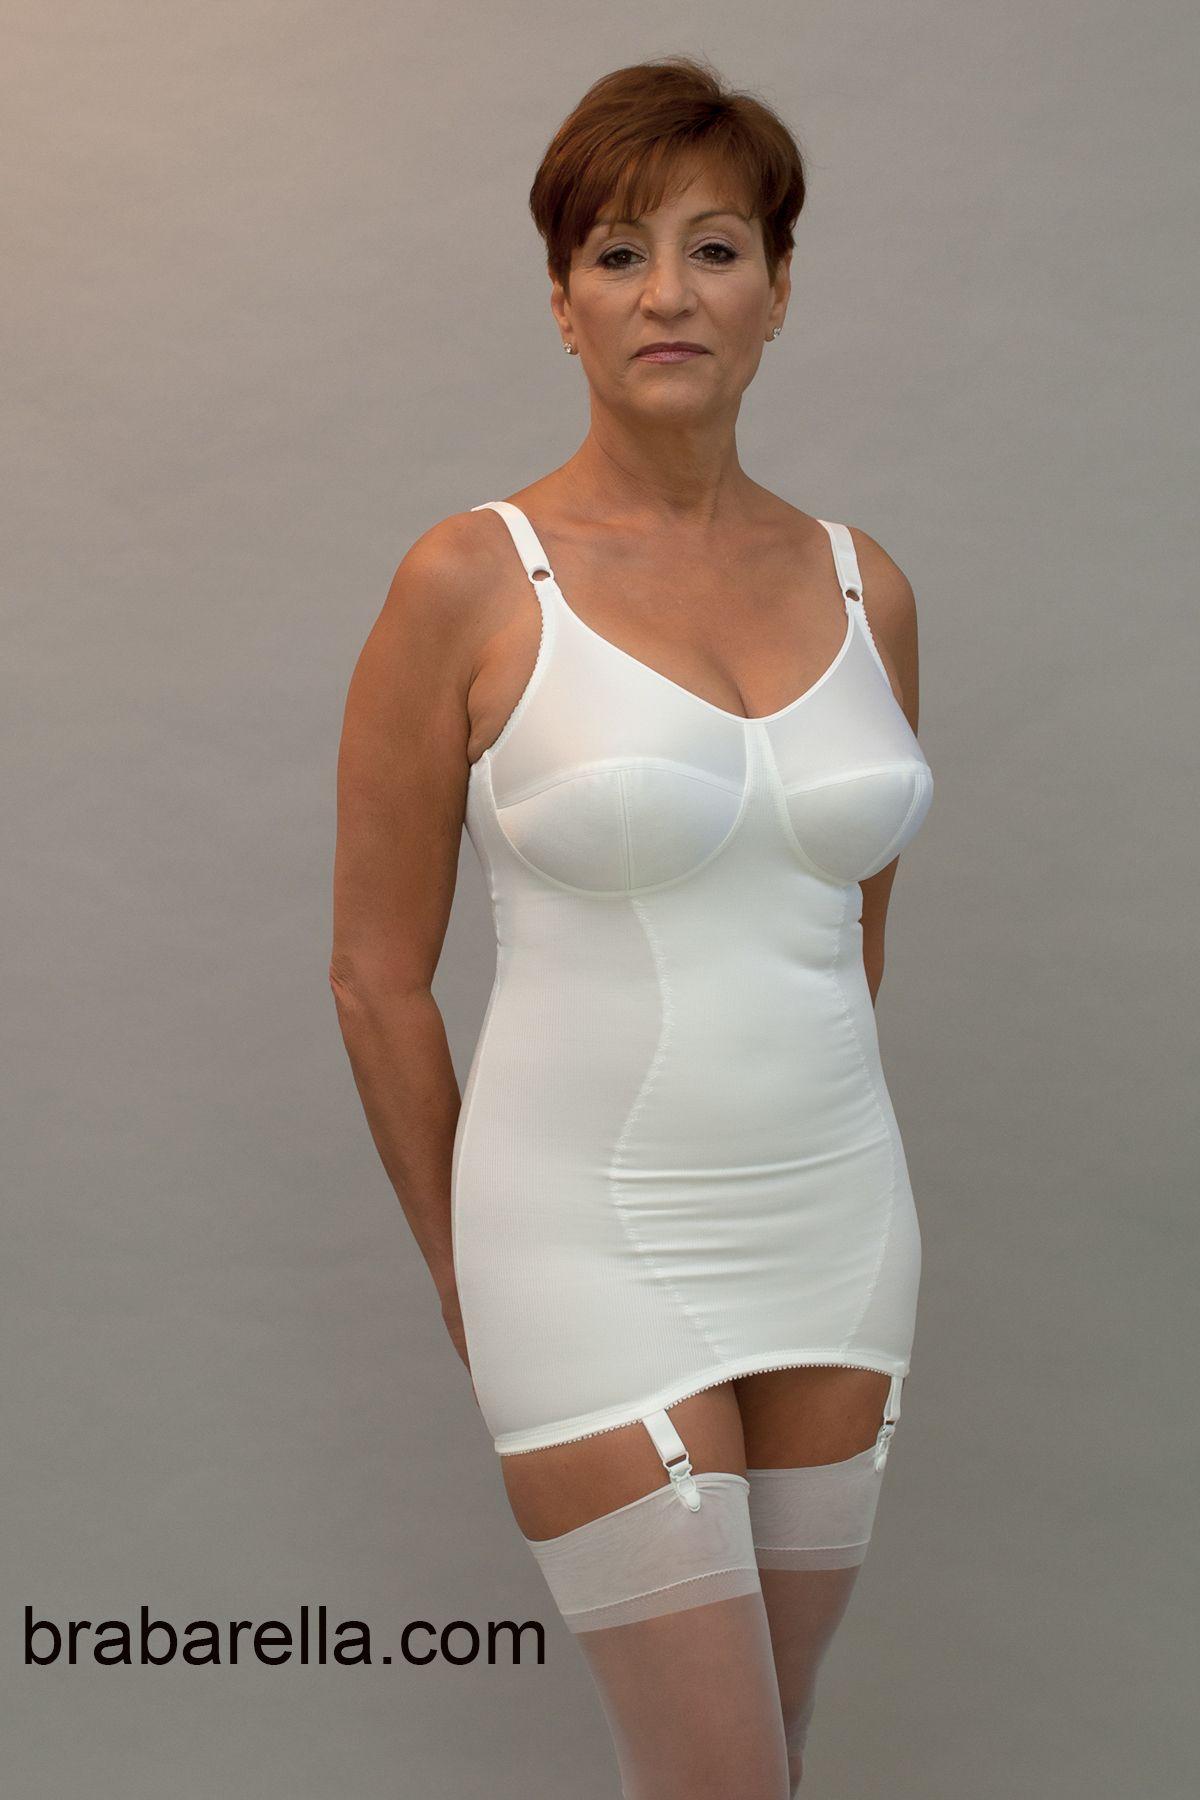 Singapore sec sch girl nude